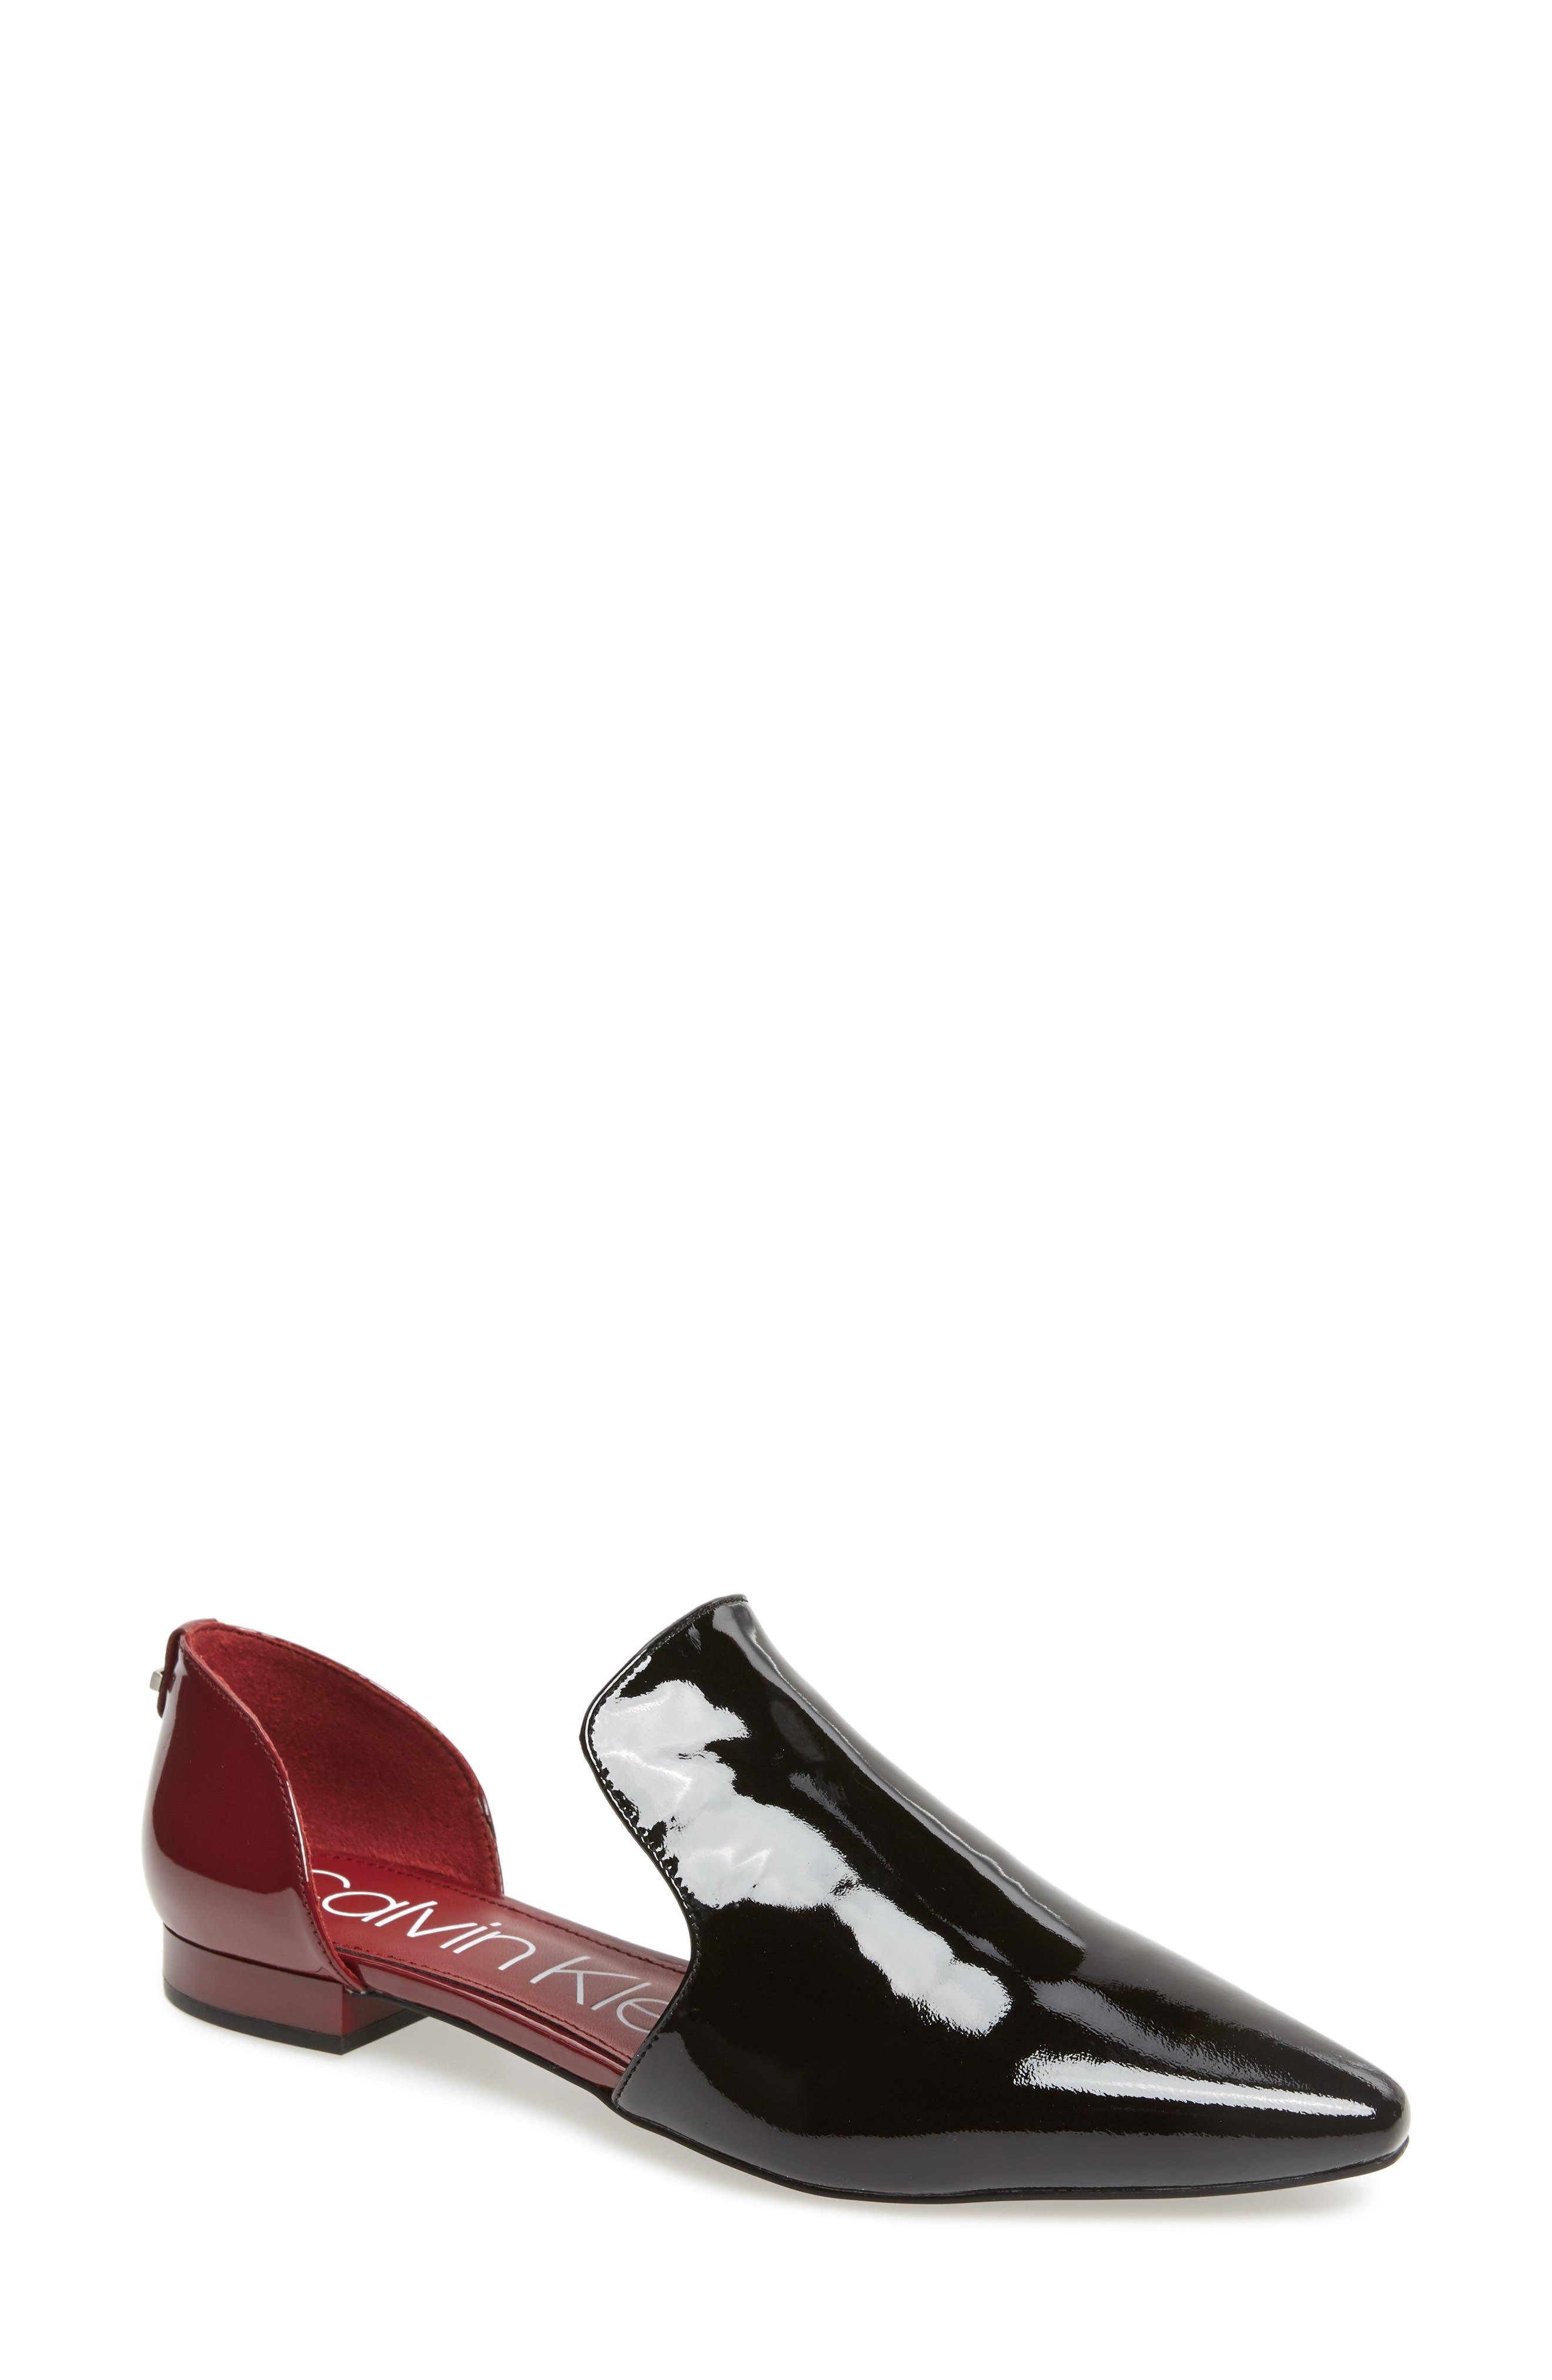 Calvin Klein Edona Loafer Flat, Black